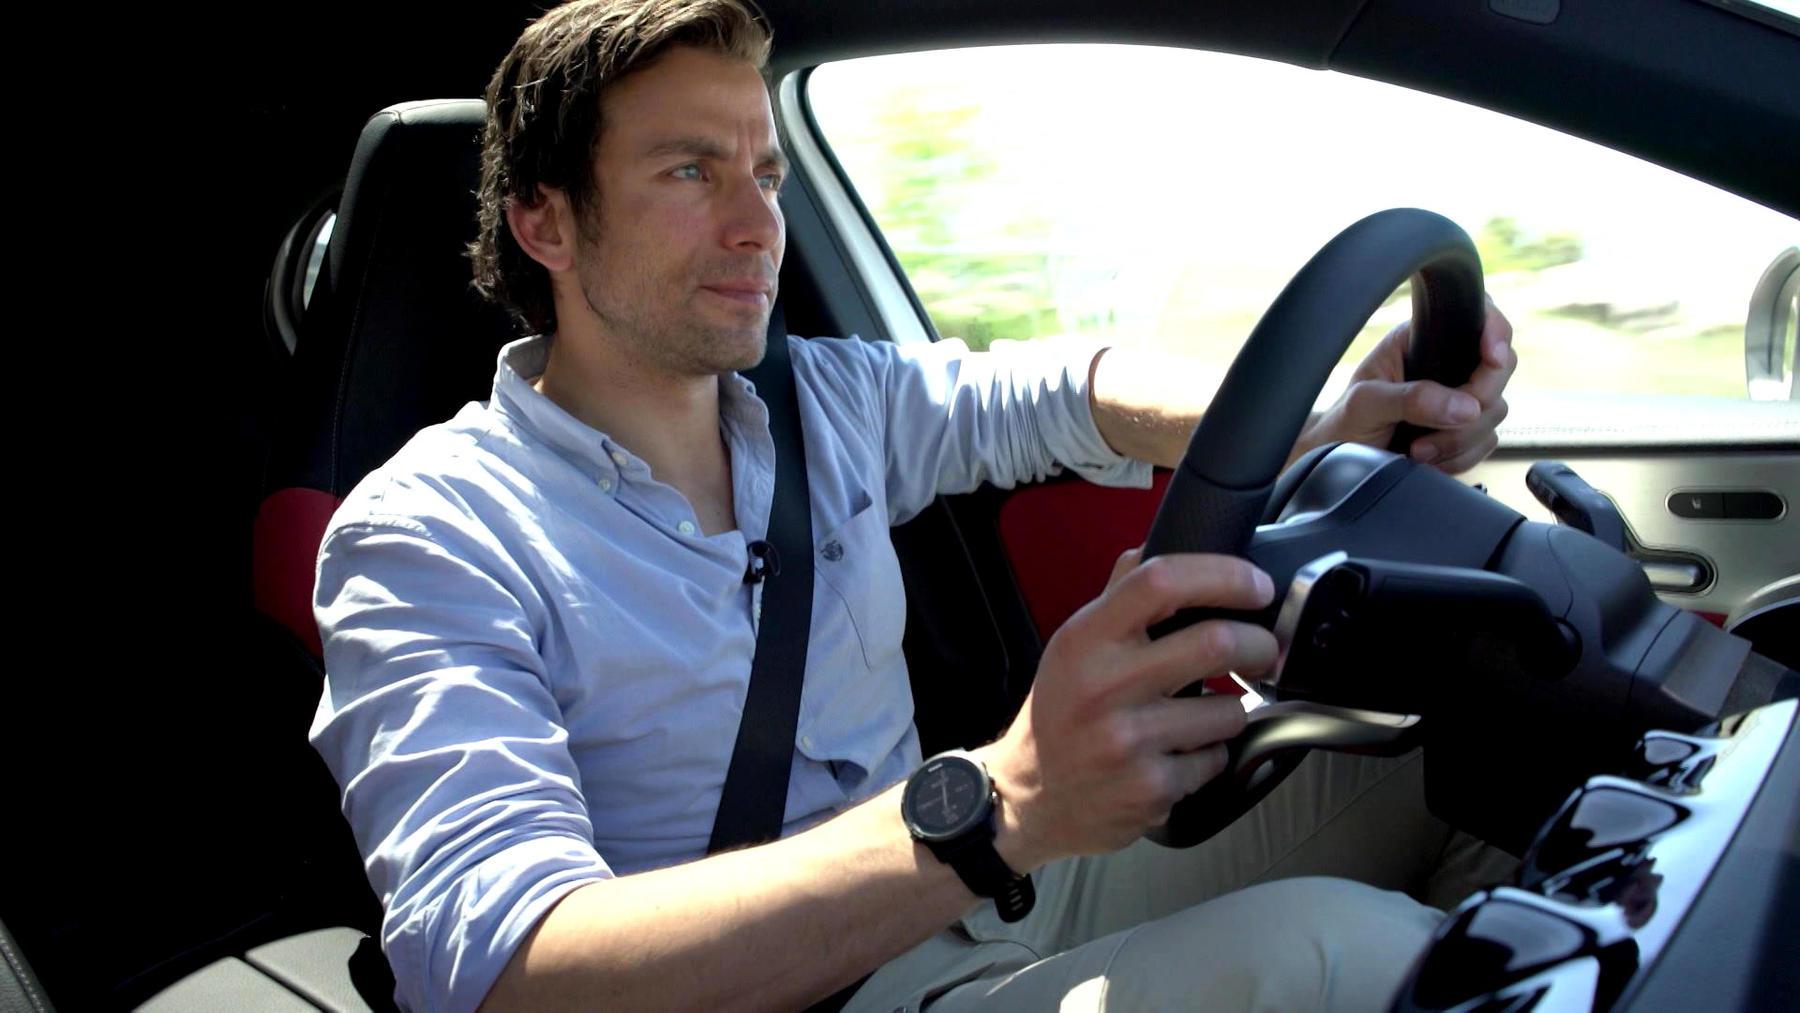 Thema u.a.: Fahrbericht: Mercedes A-Klasse mit Andy